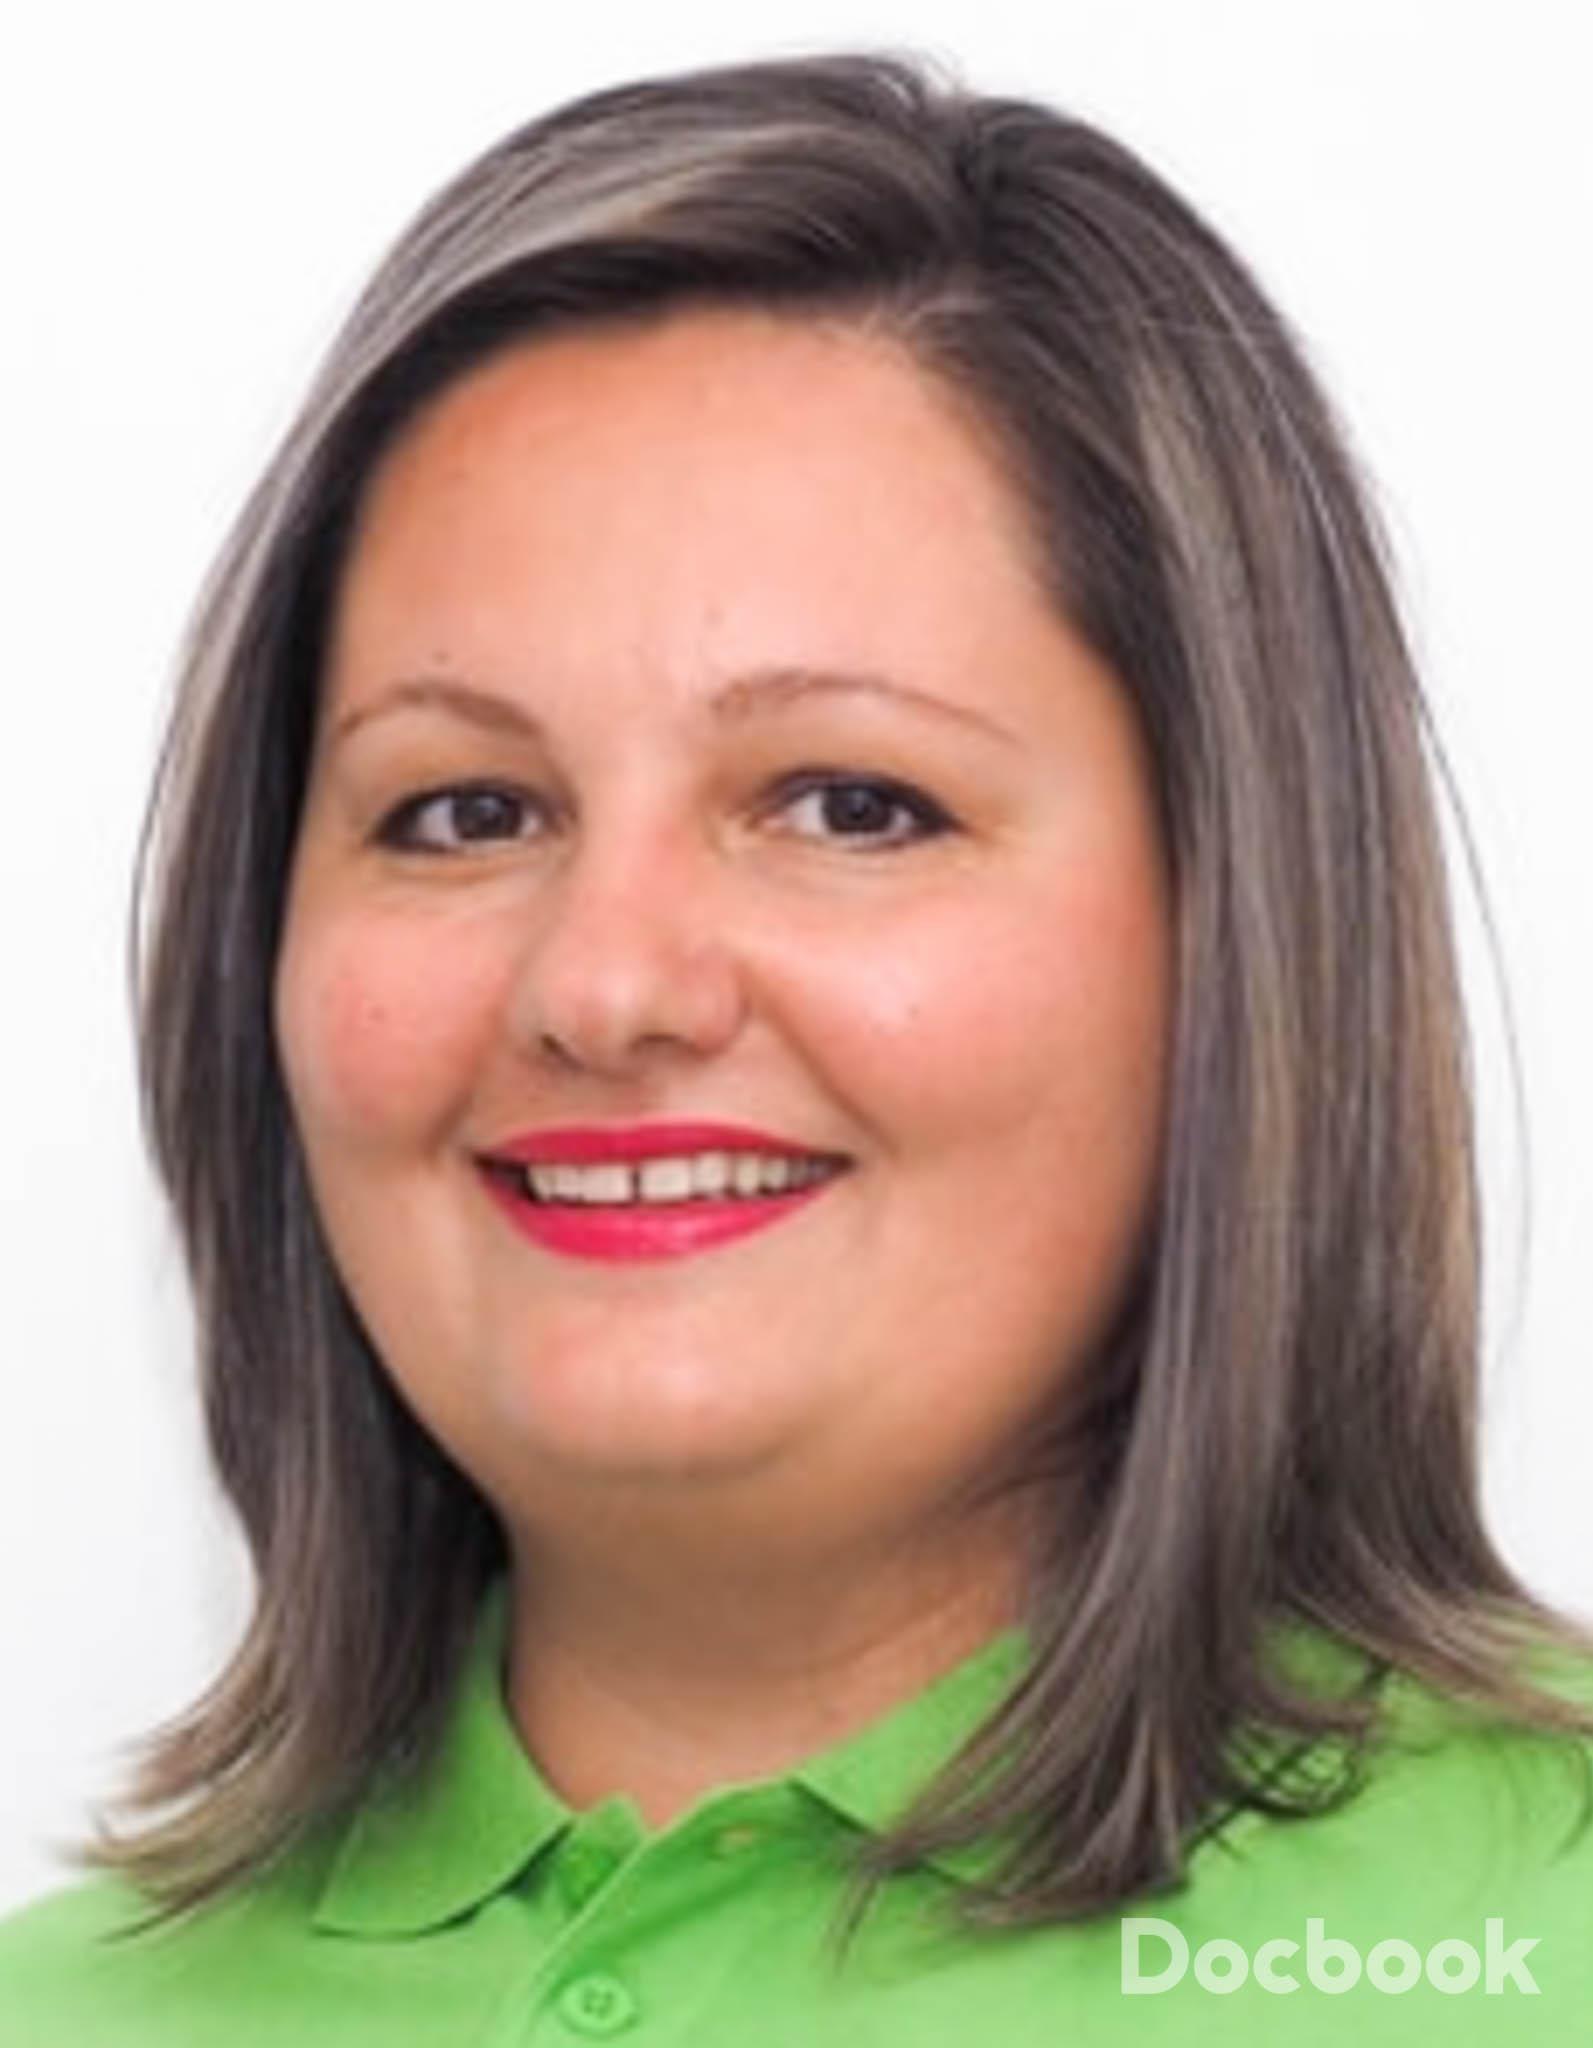 Dr. Adriana Gherghe